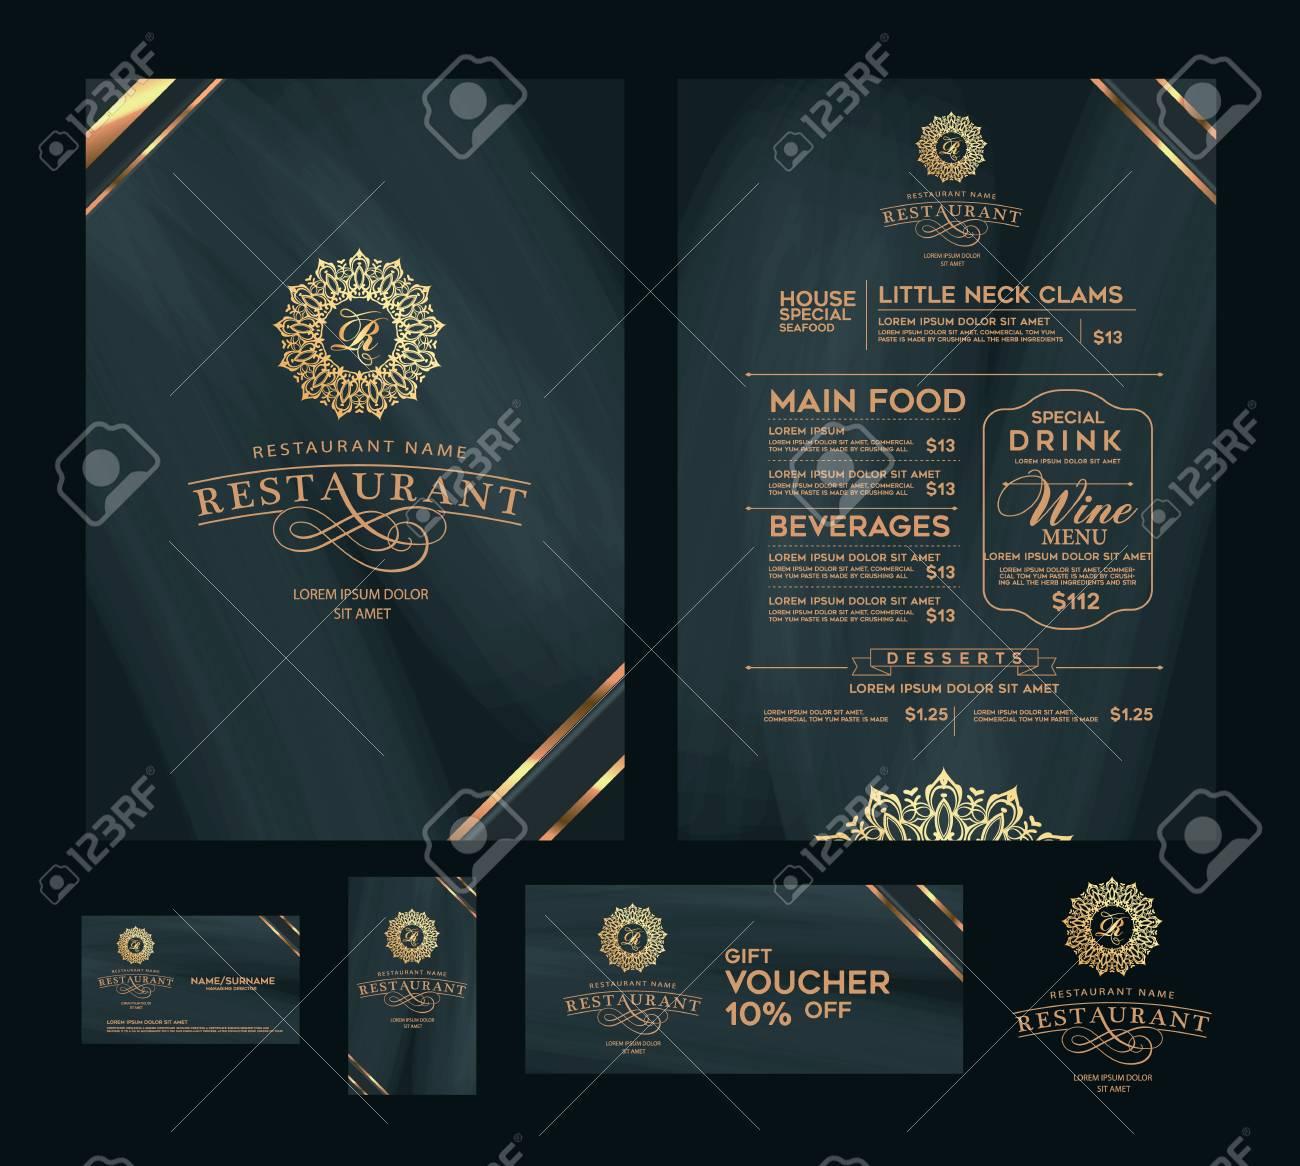 Creative Menu Design Layout Design Design Set For Menu Restaurant Royalty Free Cliparts Vectors And Stock Illustration Image 71498970